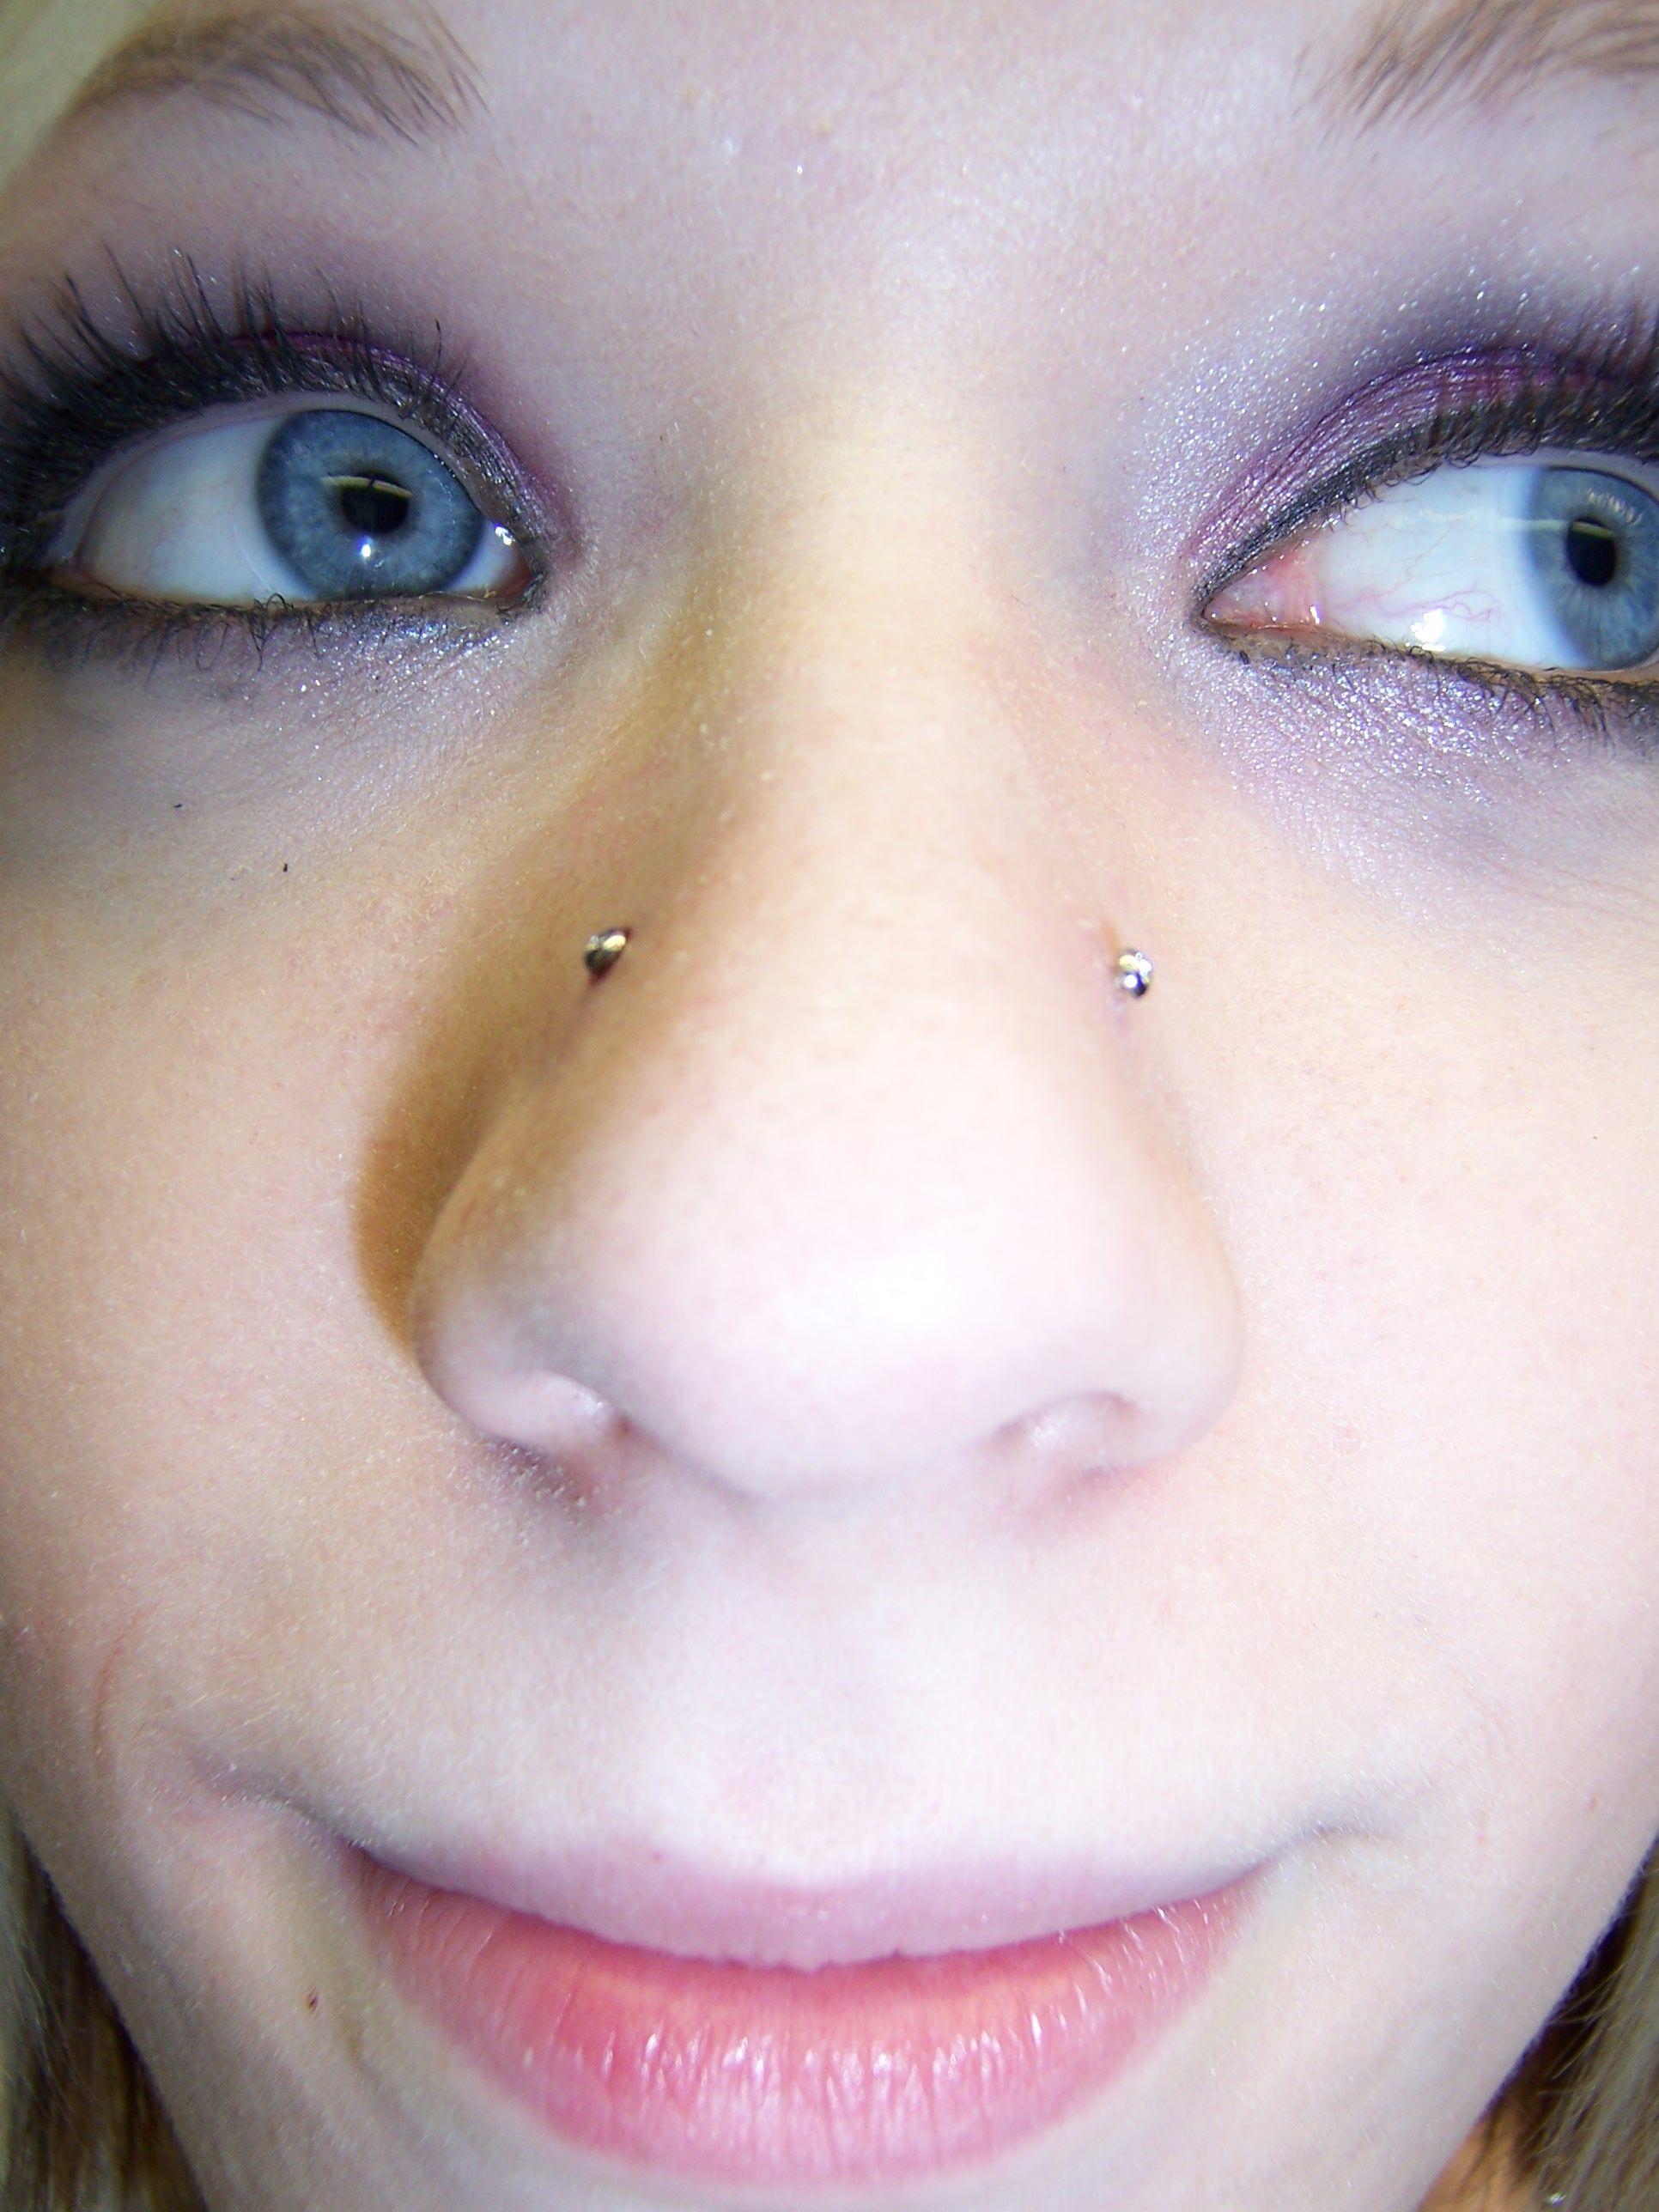 High up nose piercing  I uc high nostrils  Holes I create  Pinterest  Piercings